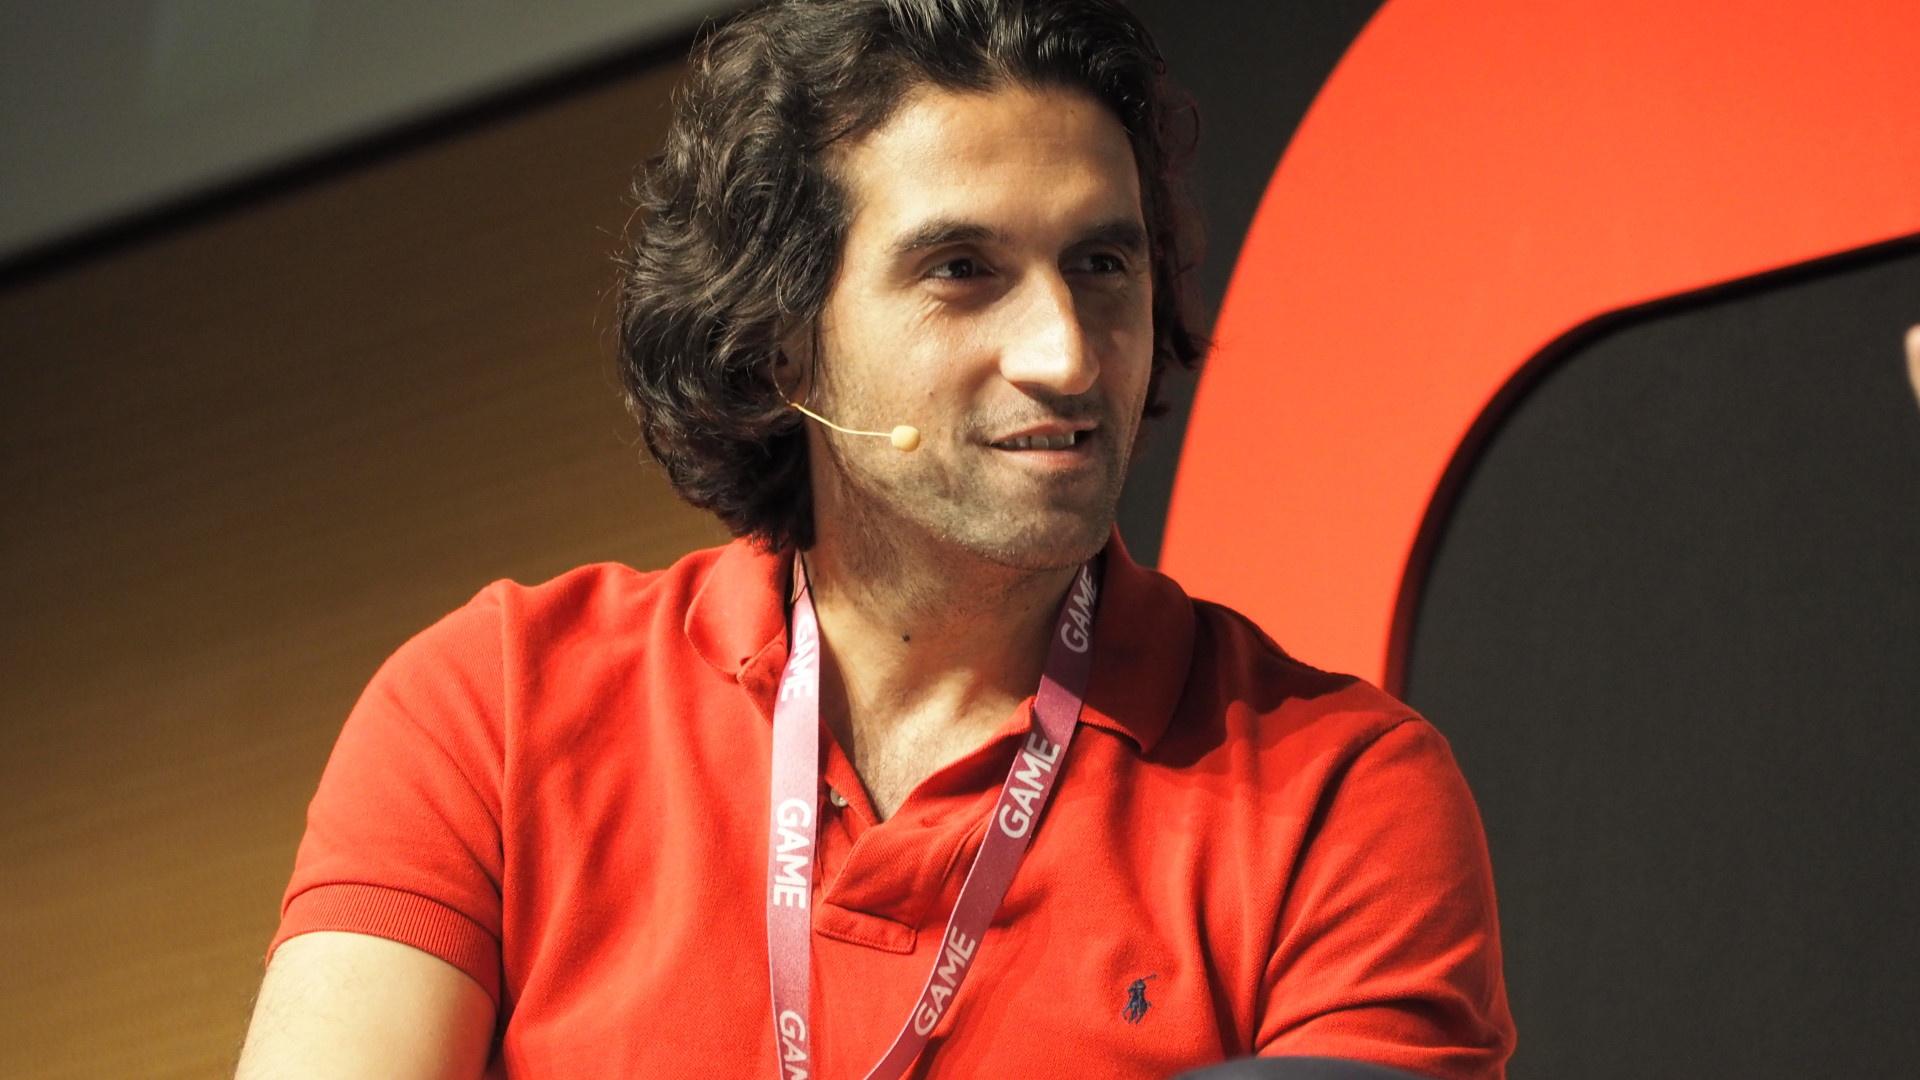 Юсеф Фарес: Cyberpunk 2077 получила неоправданное количество критики